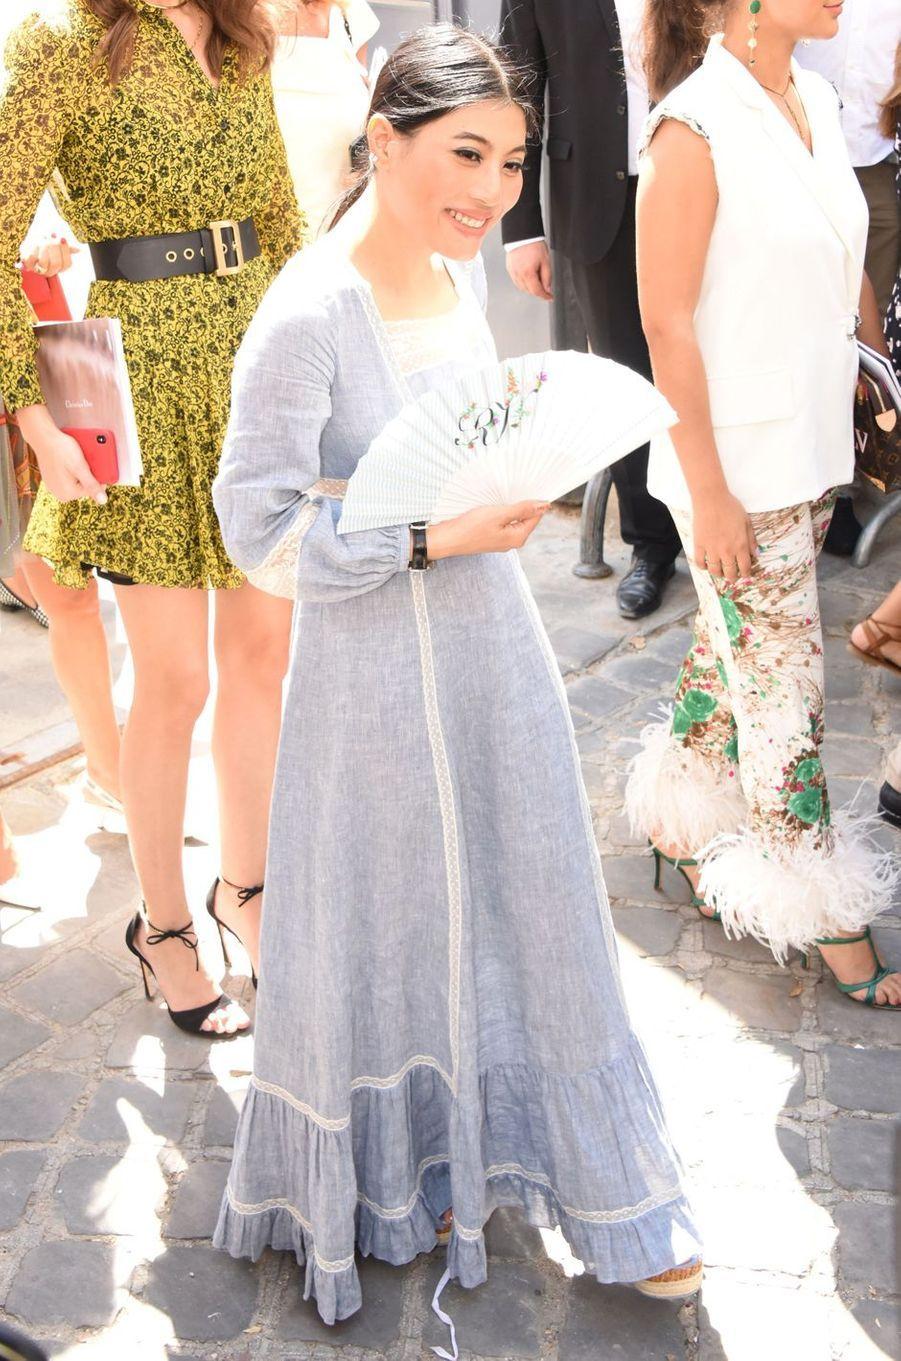 La princesse Sirivannavari Nariratana de Thaïlande à la Fashion Week à Paris, le 2 juillet 2018